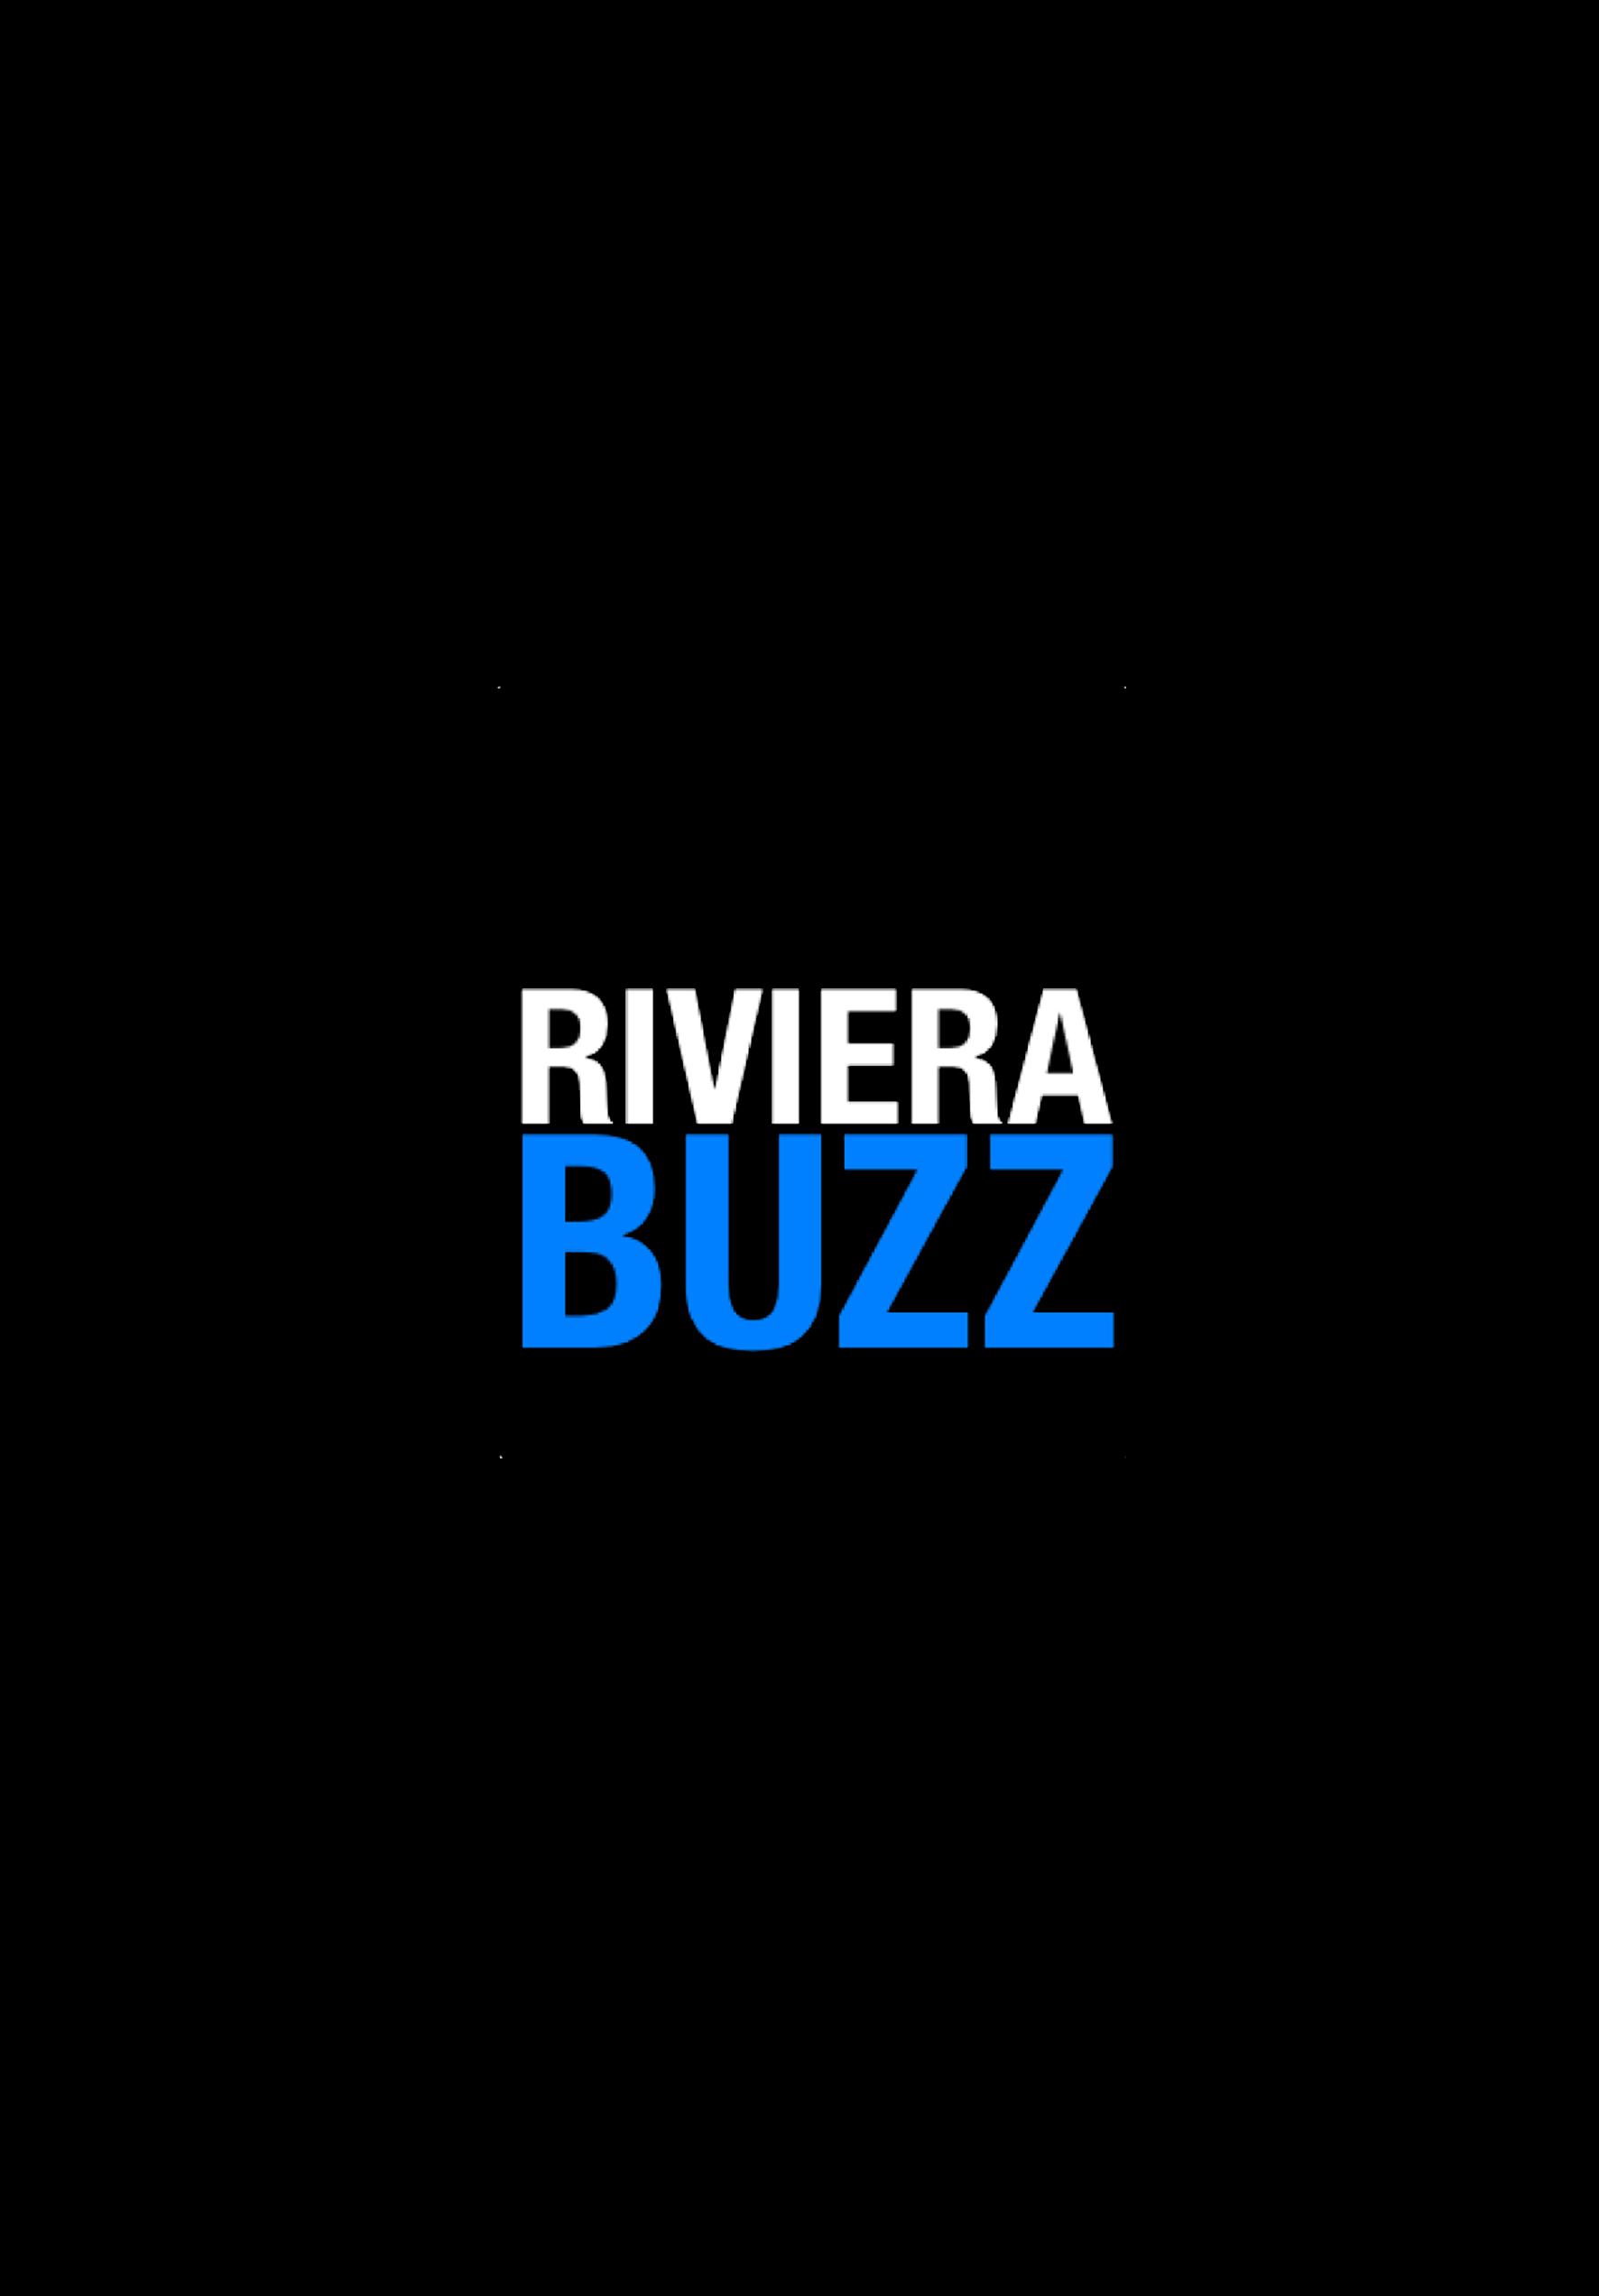 Riviera-Buzz-1